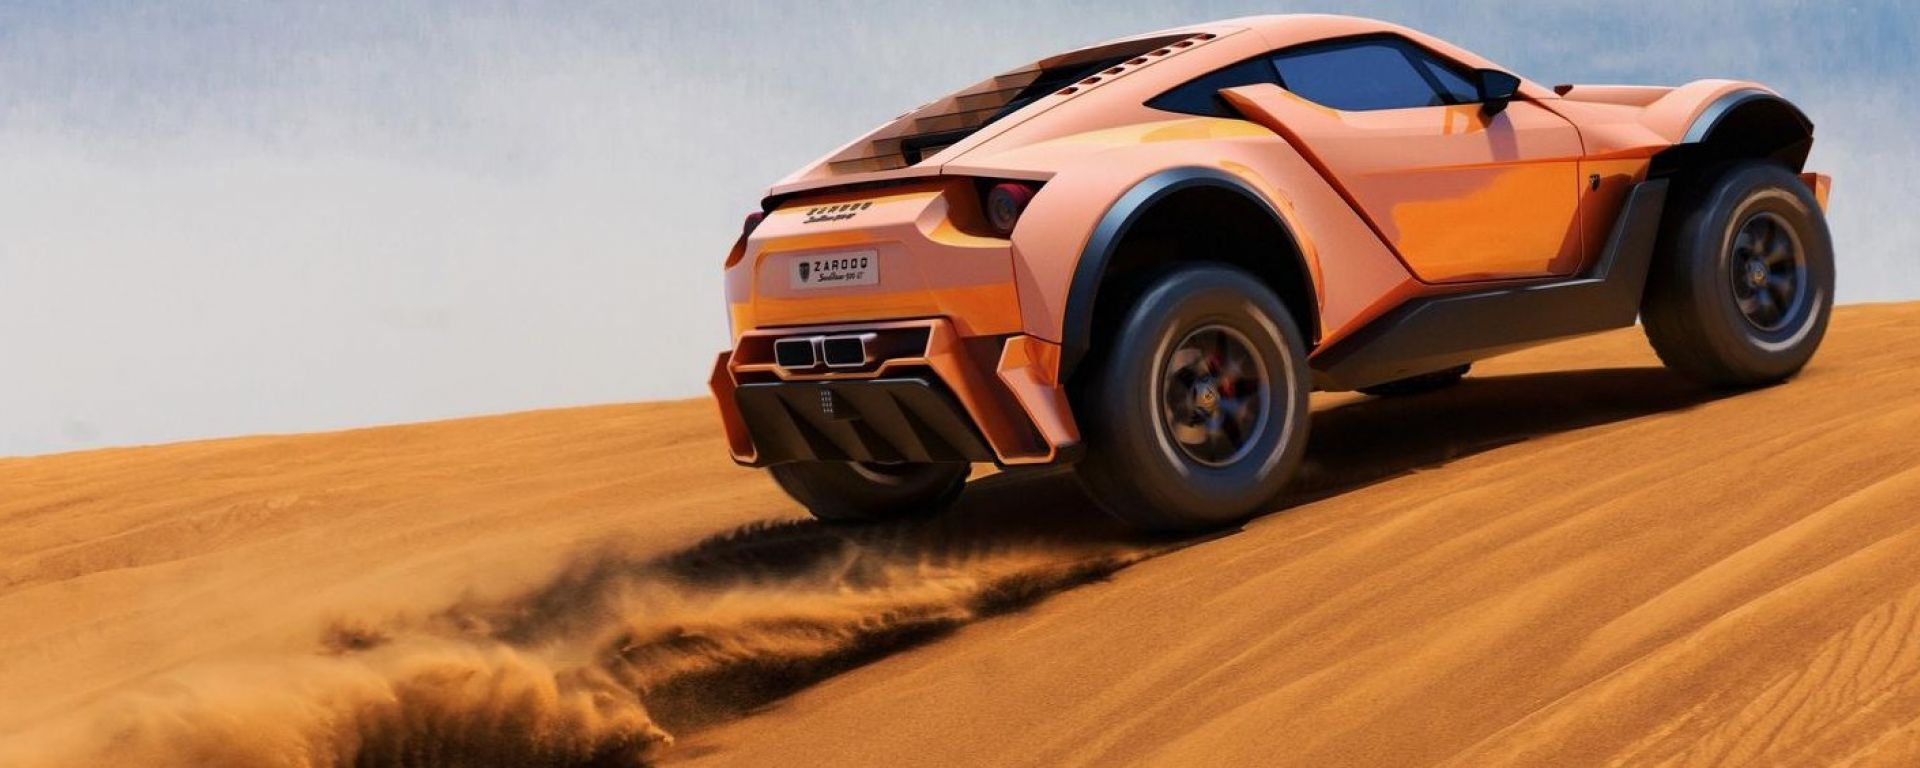 Zarooq Sand Racer 500 GT, a tutto gas nel deserto